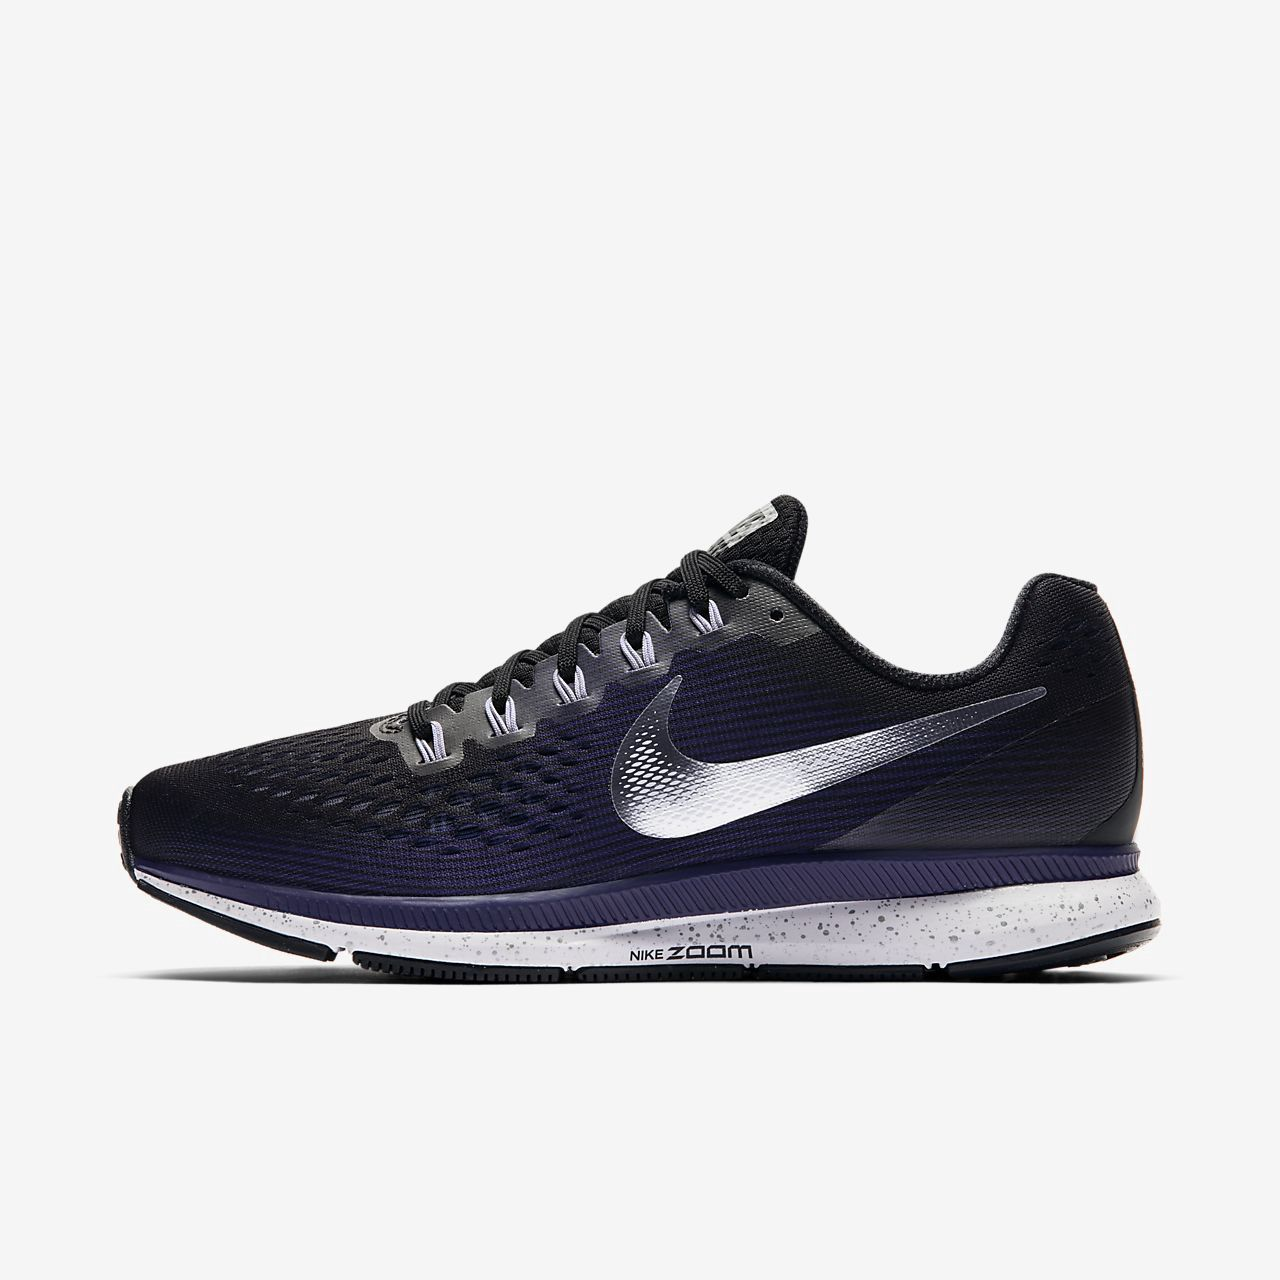 Nike Air Zoom Pegasus 34 (Wide) Women's Running Shoe 10